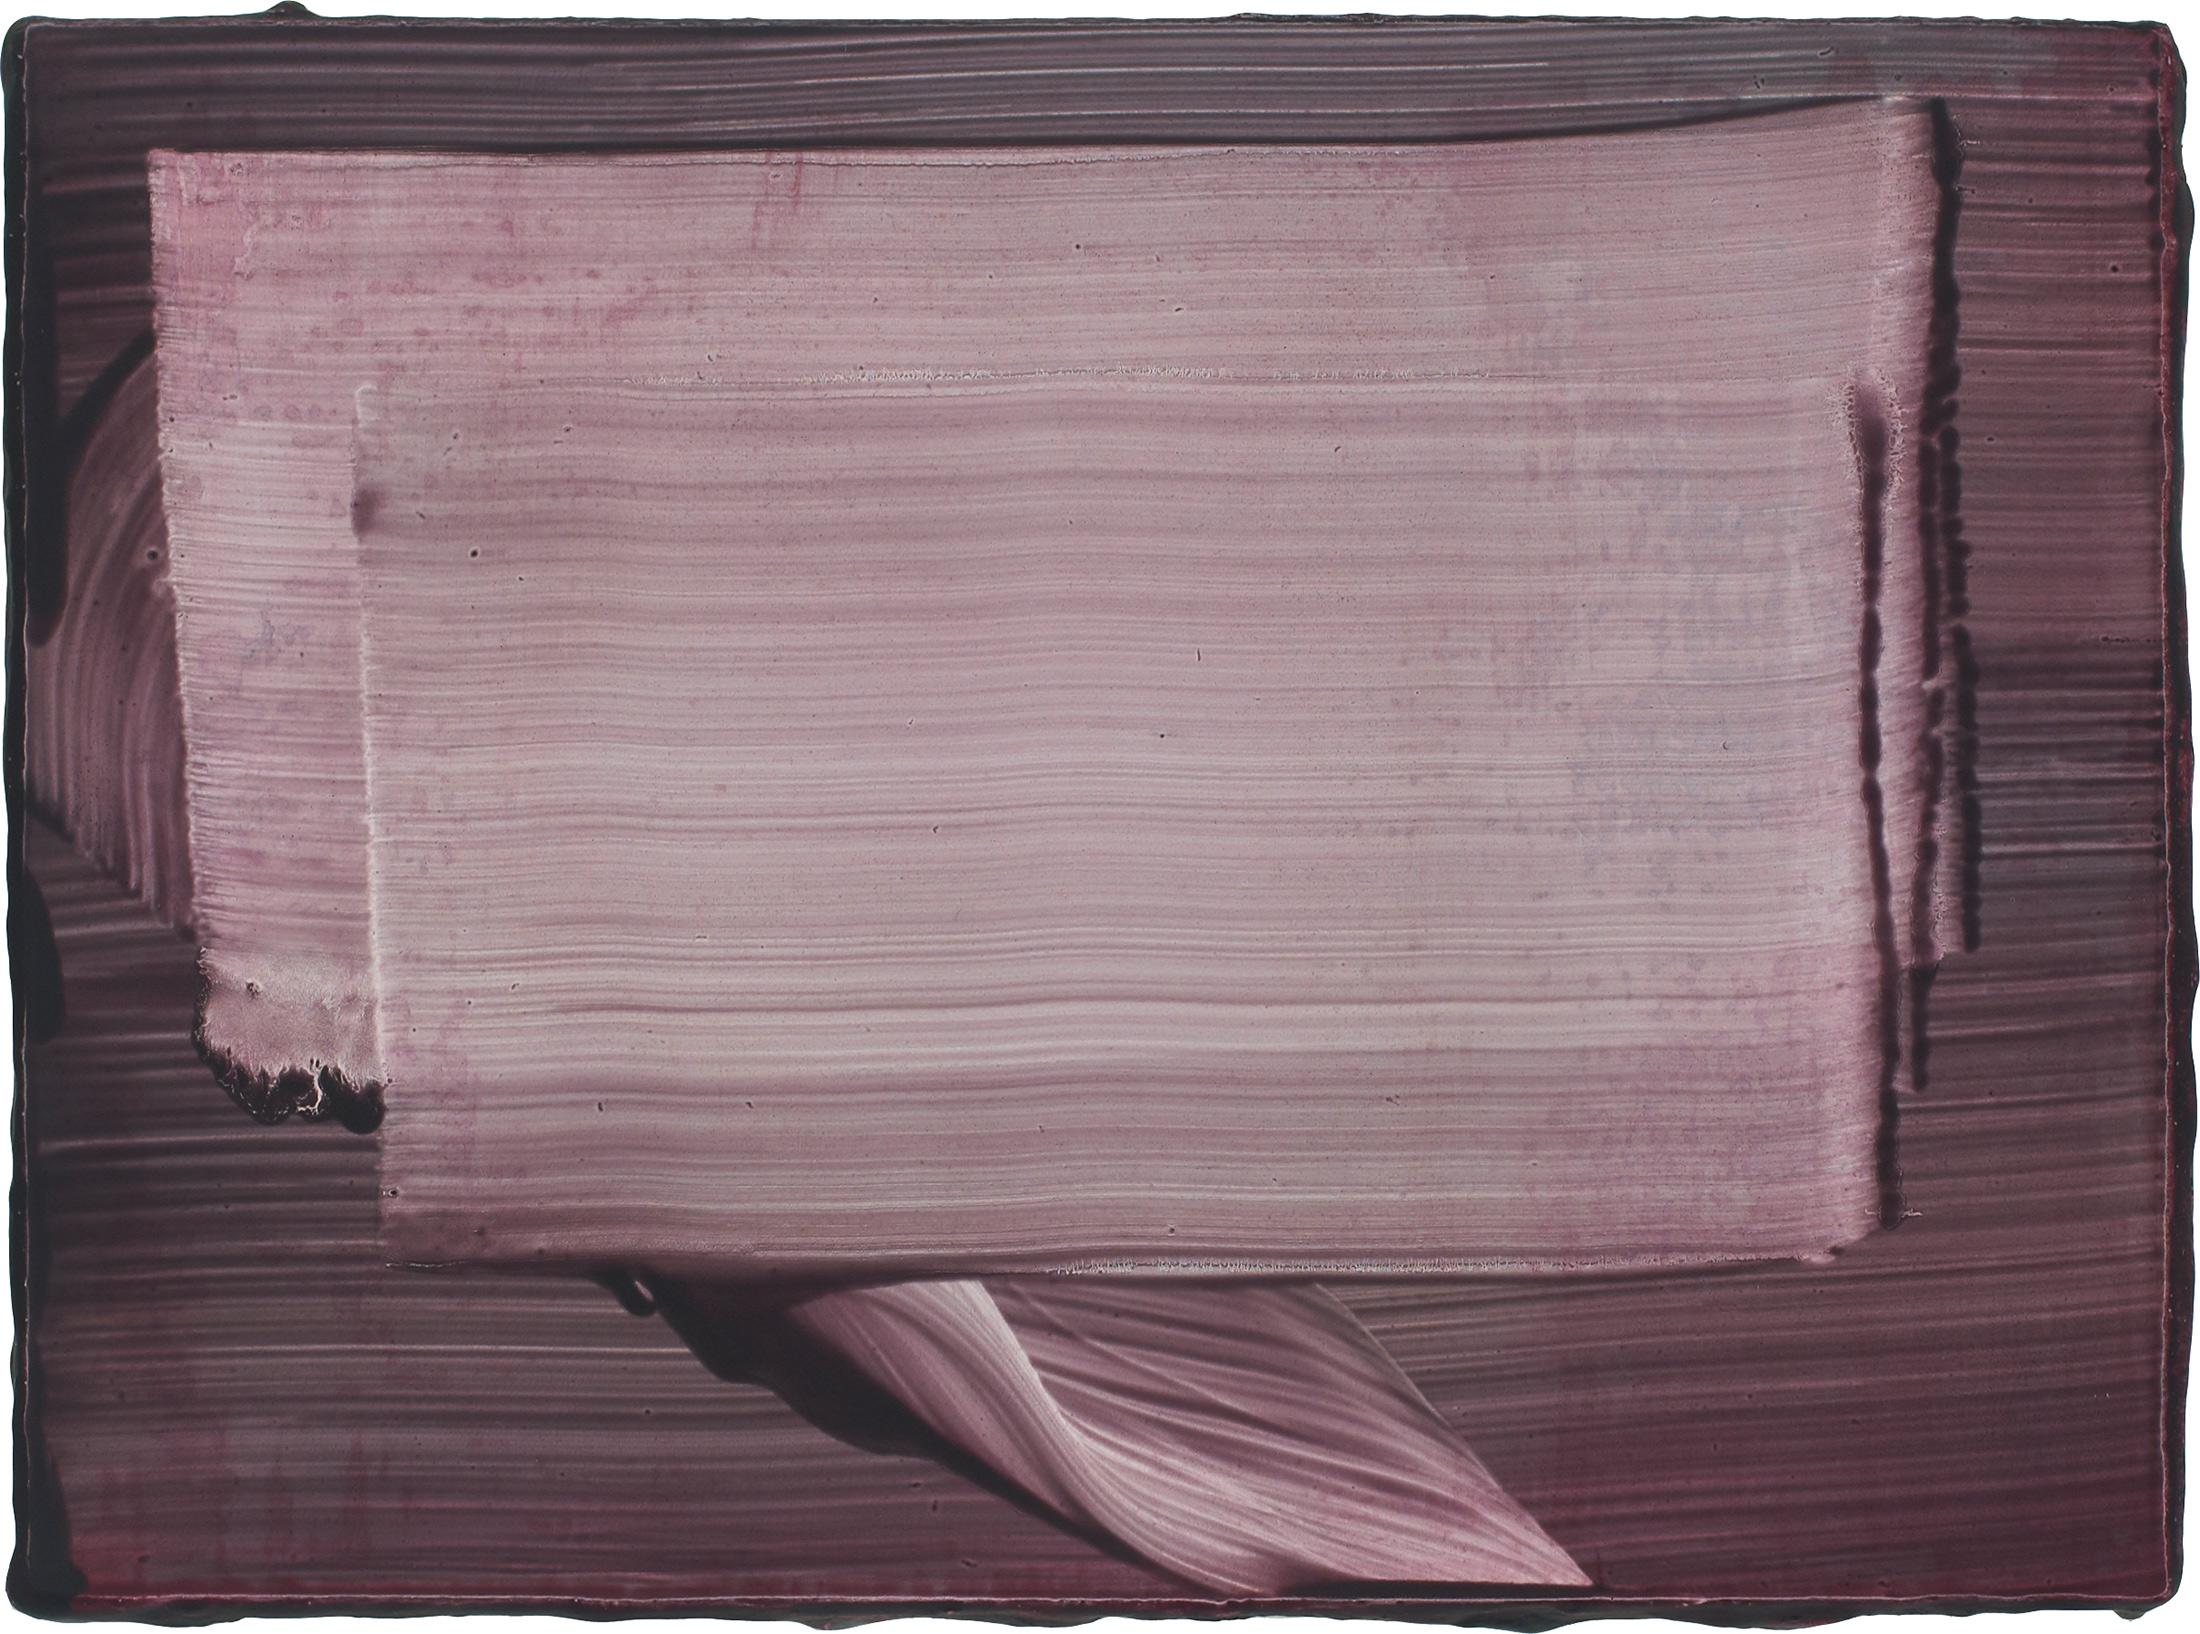 markus saile, artist, related-separat, online viewing rooms, art, nak, germany, art club, munchies, aachen,